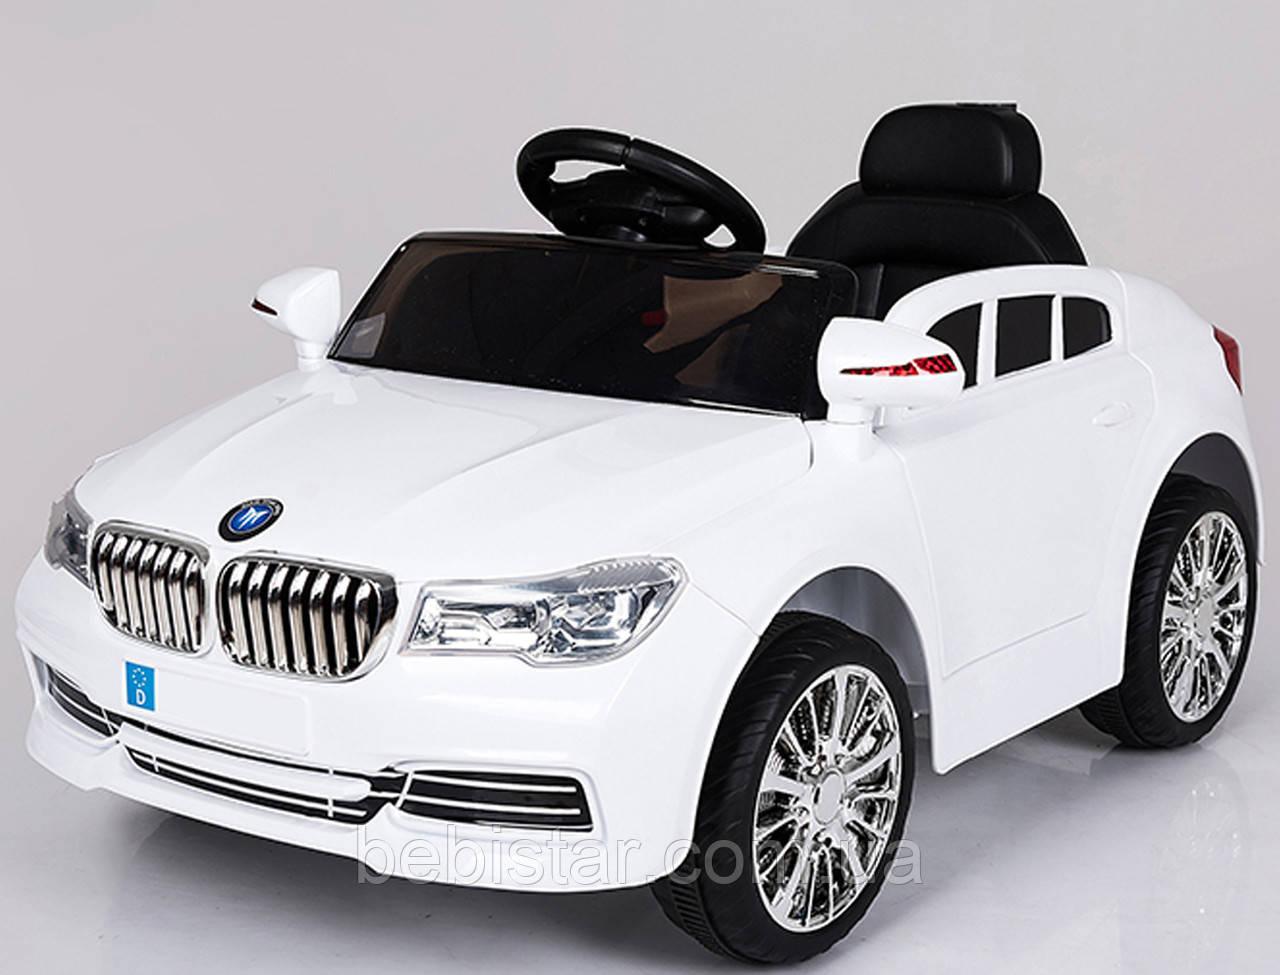 Электромобиль-спорткар белый XM-826 WHITE для деток 3-8 лет с пультом, аккумулятор 2*6V4.5AH, мотор 2*25W